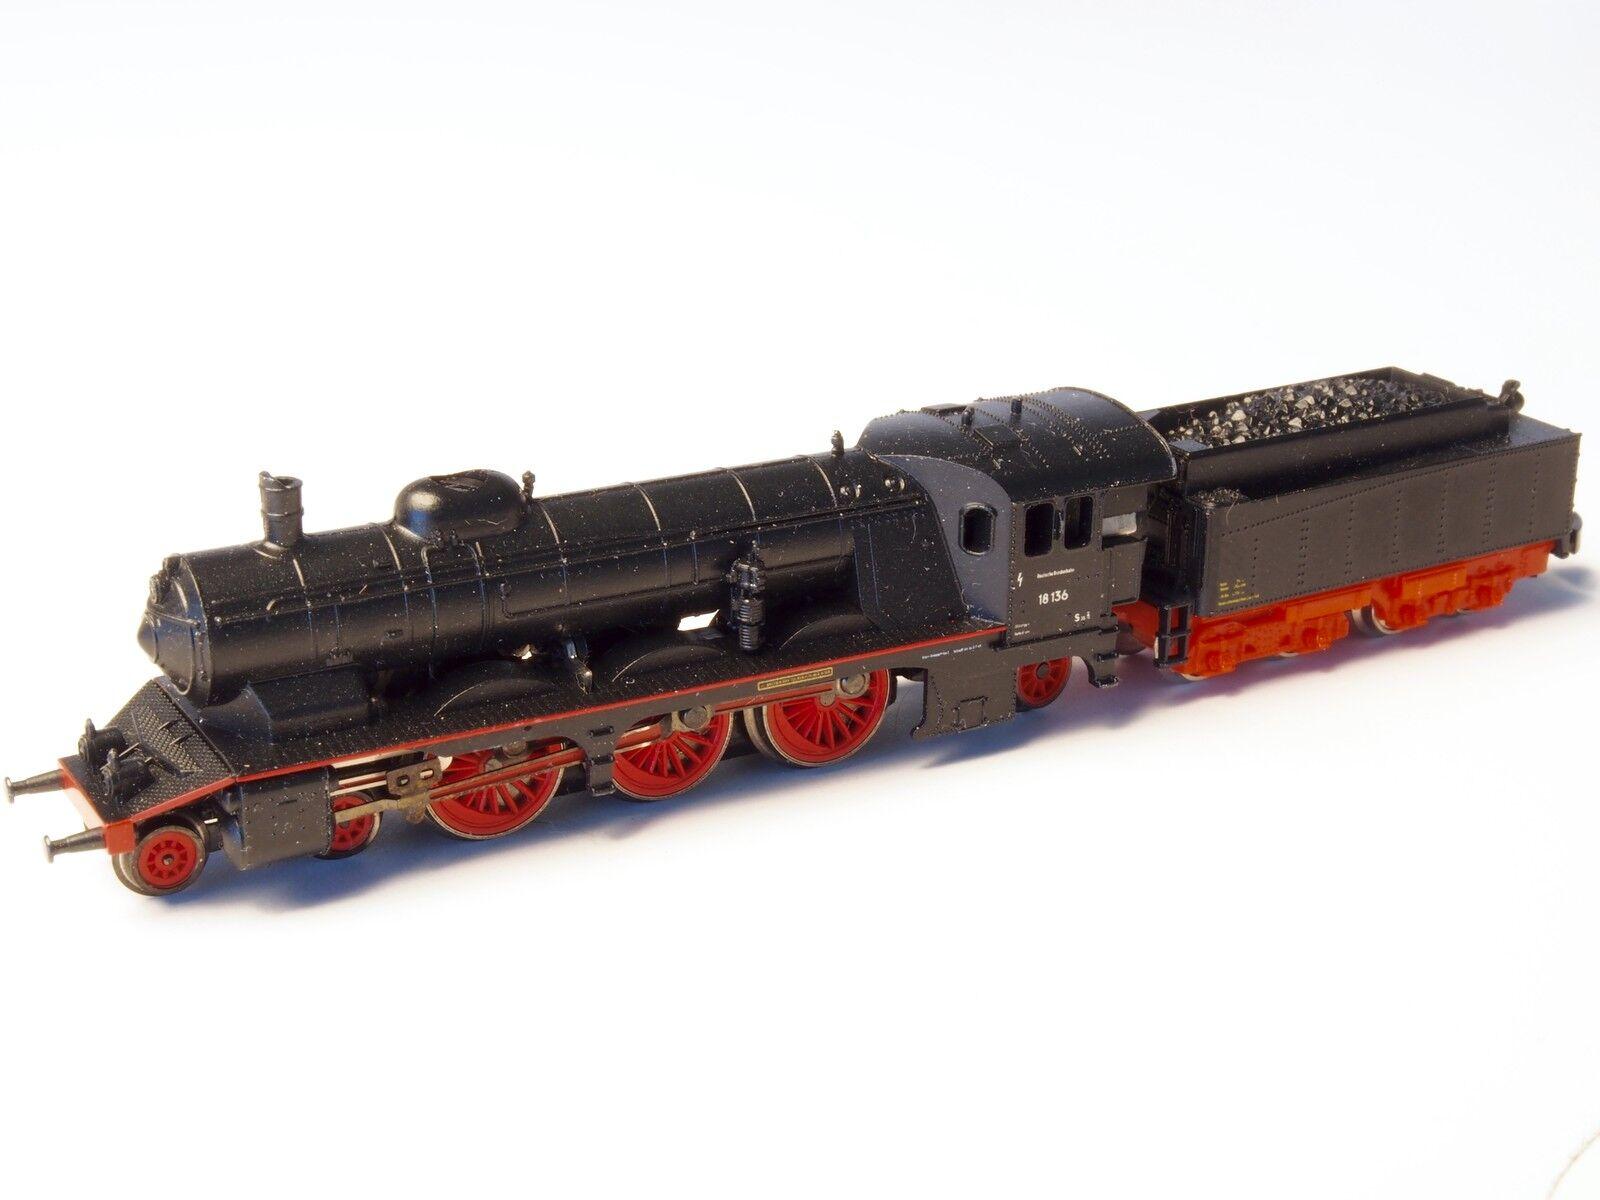 Marklin Z-Scale Db- Express Steam Locomotiva con Tender Cl 18 Pacific 5 Asta